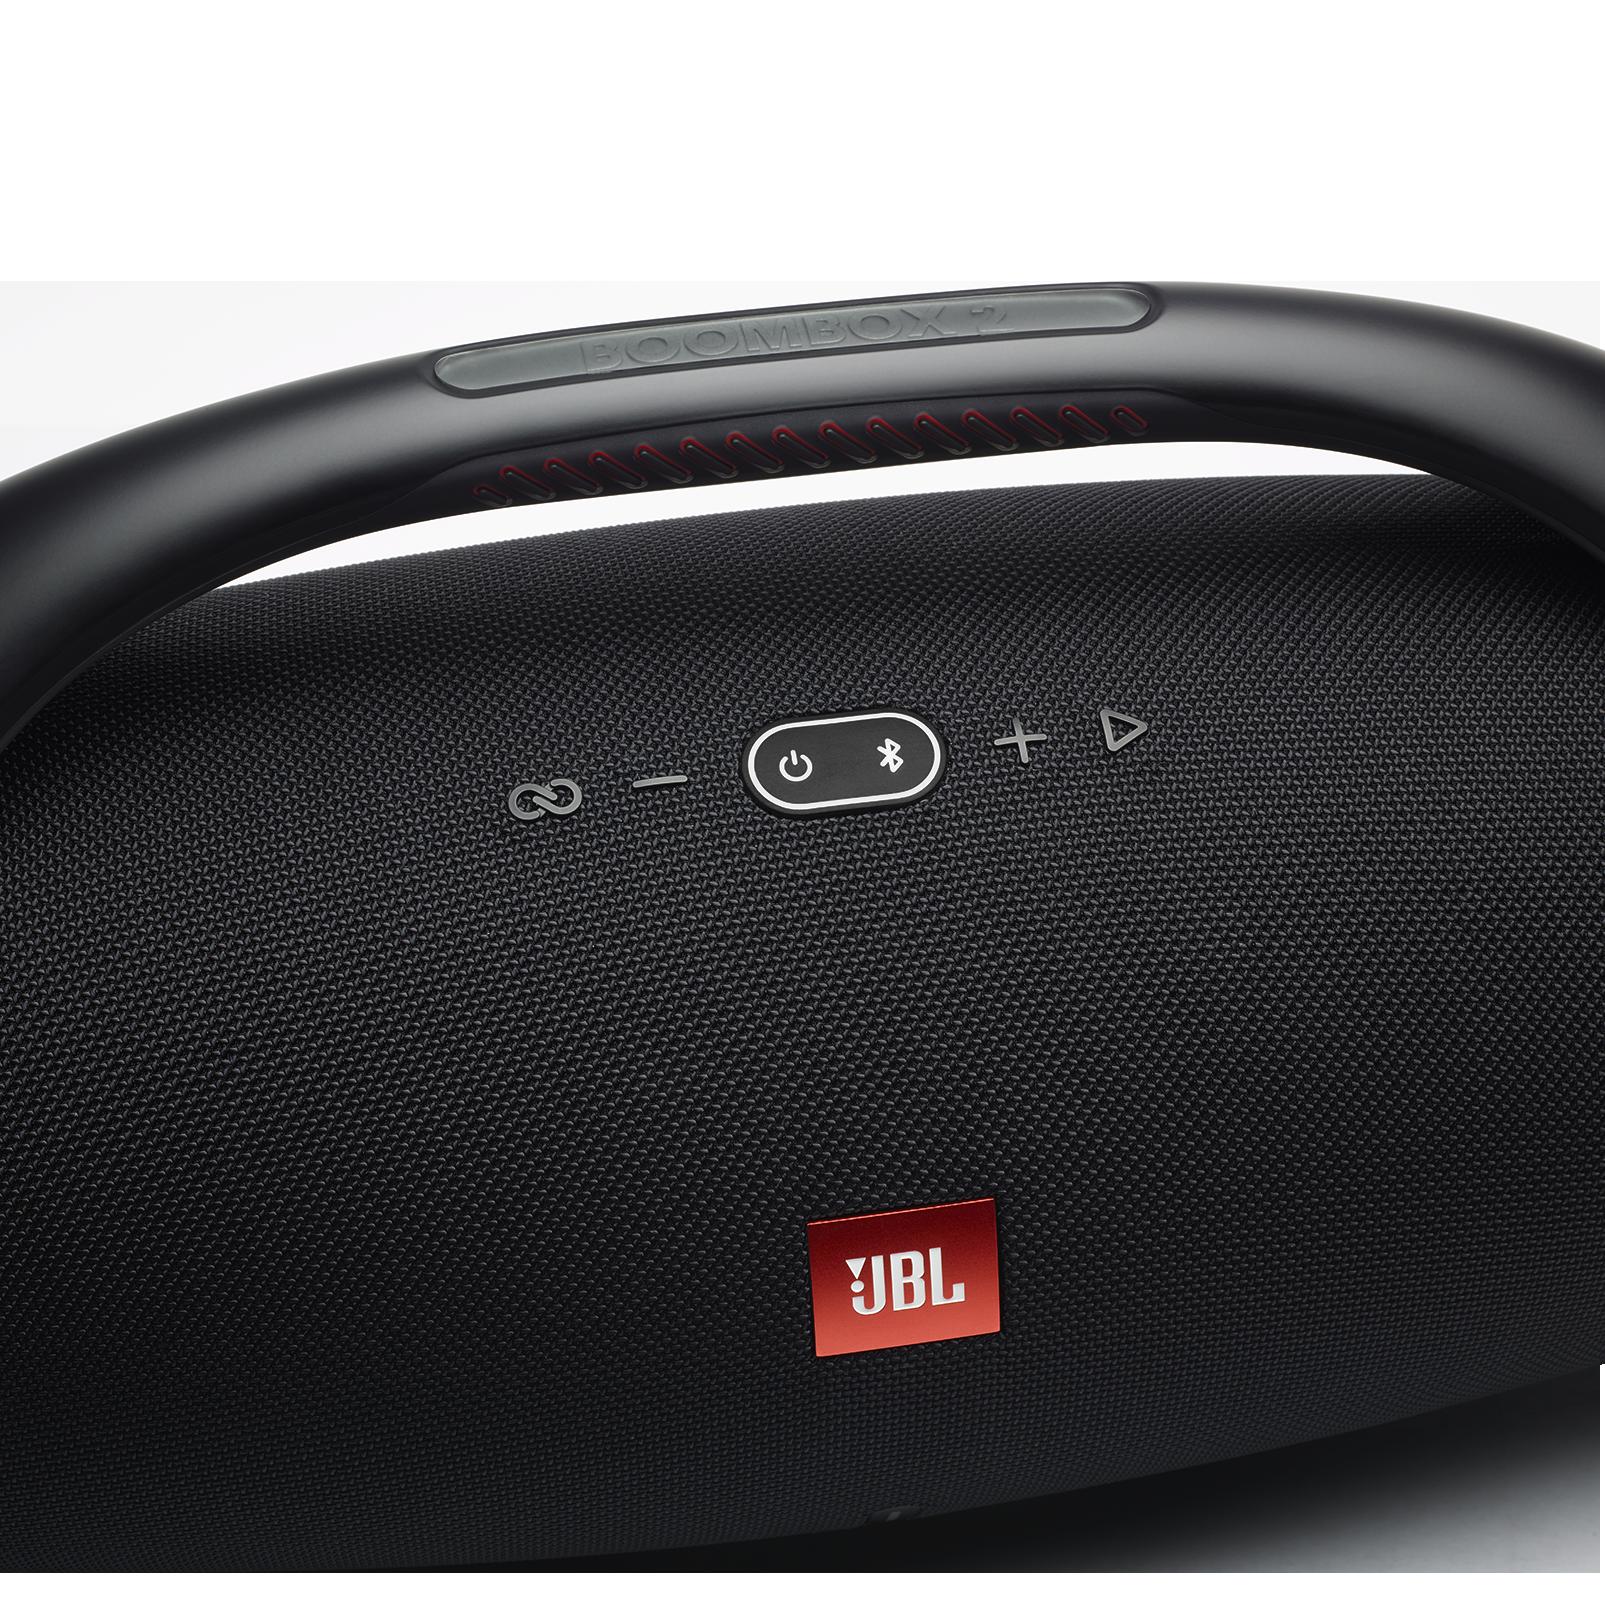 JBL Boombox 2 - Black - Portable Bluetooth Speaker - Detailshot 1